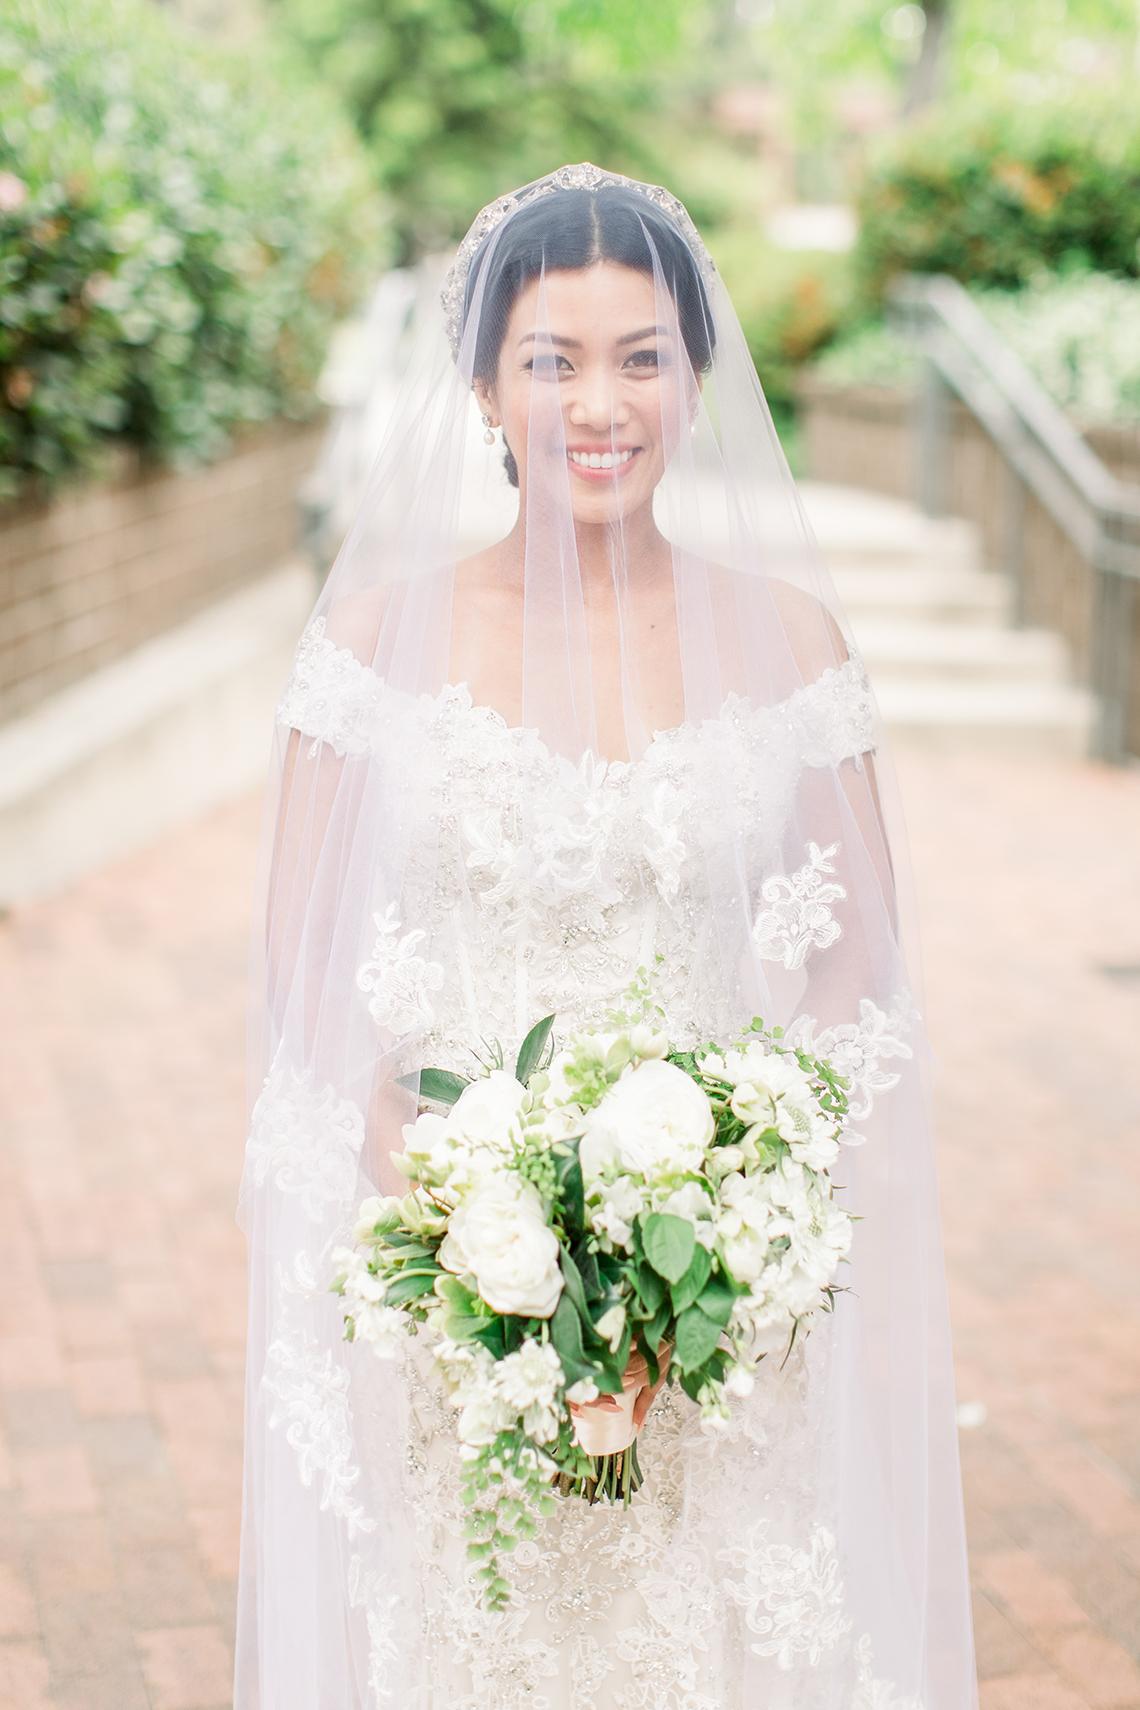 Orange Citrus Inspired Wedding at Lido House Newport Beach – Brett Hickman 18